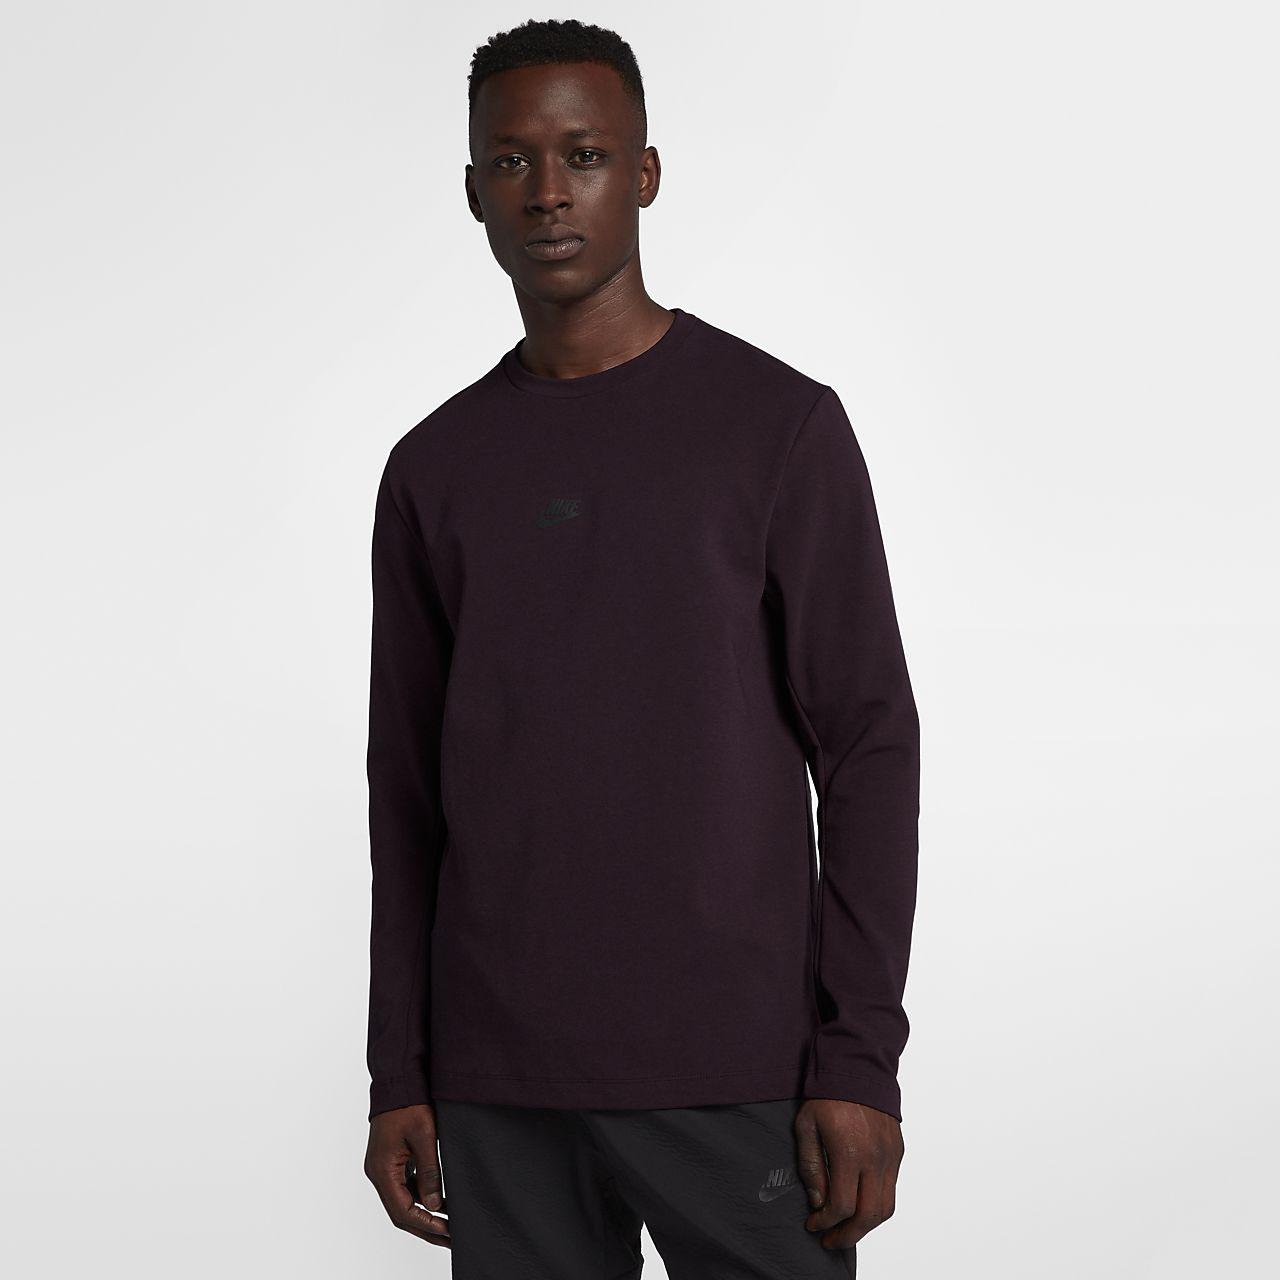 Nike Sportswear Tech Pack Herenshirt met lange mouwen en ronde hals